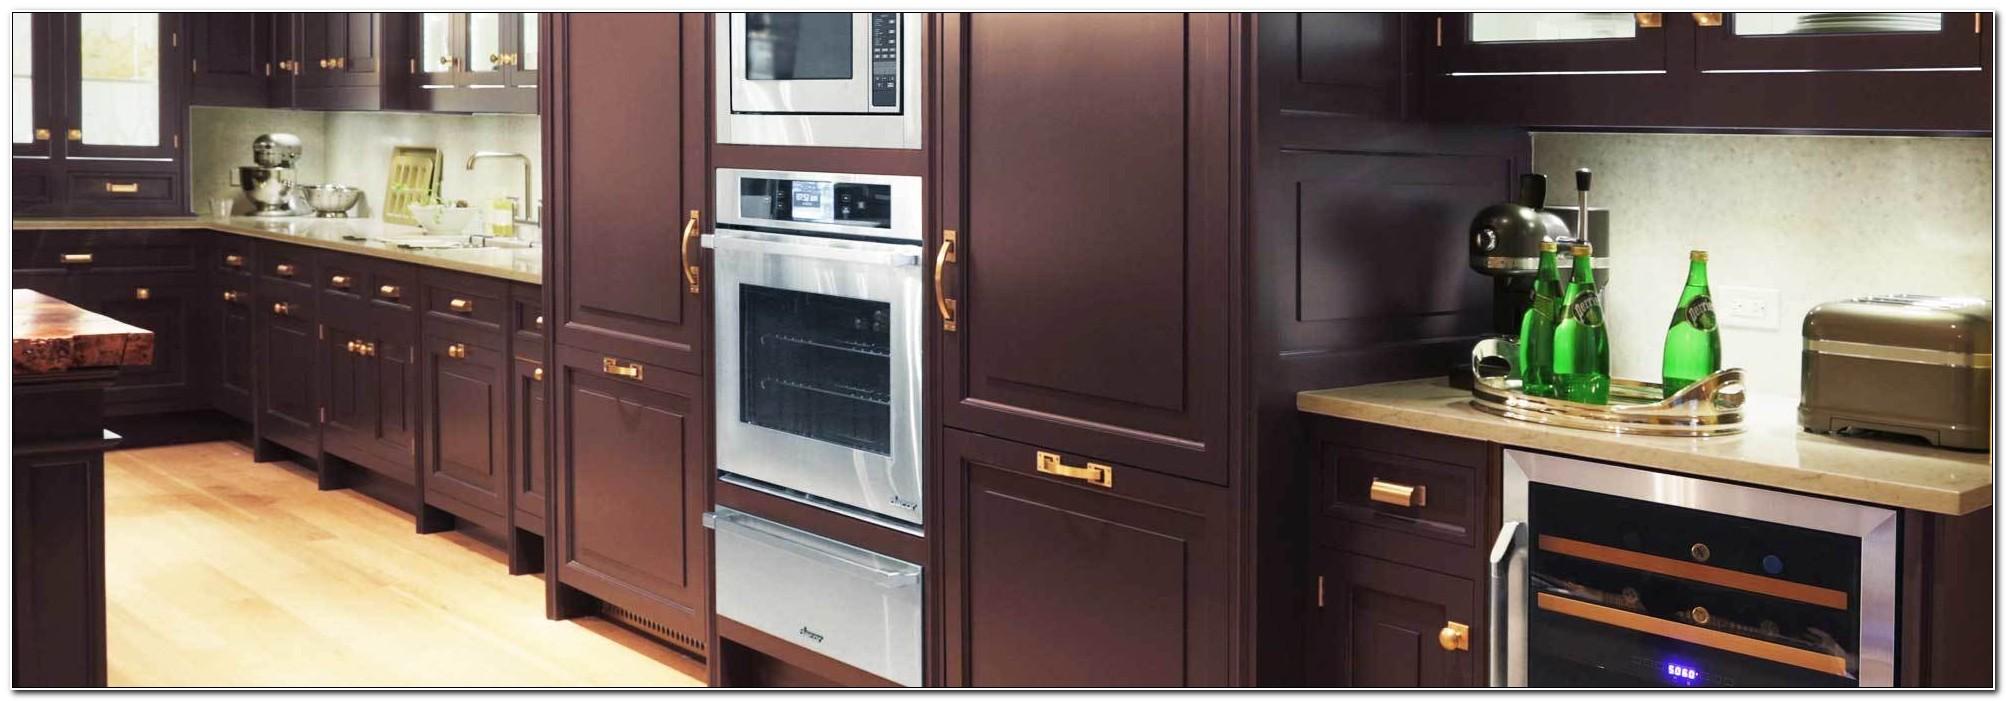 Best Mid Level Kitchen Cabinets